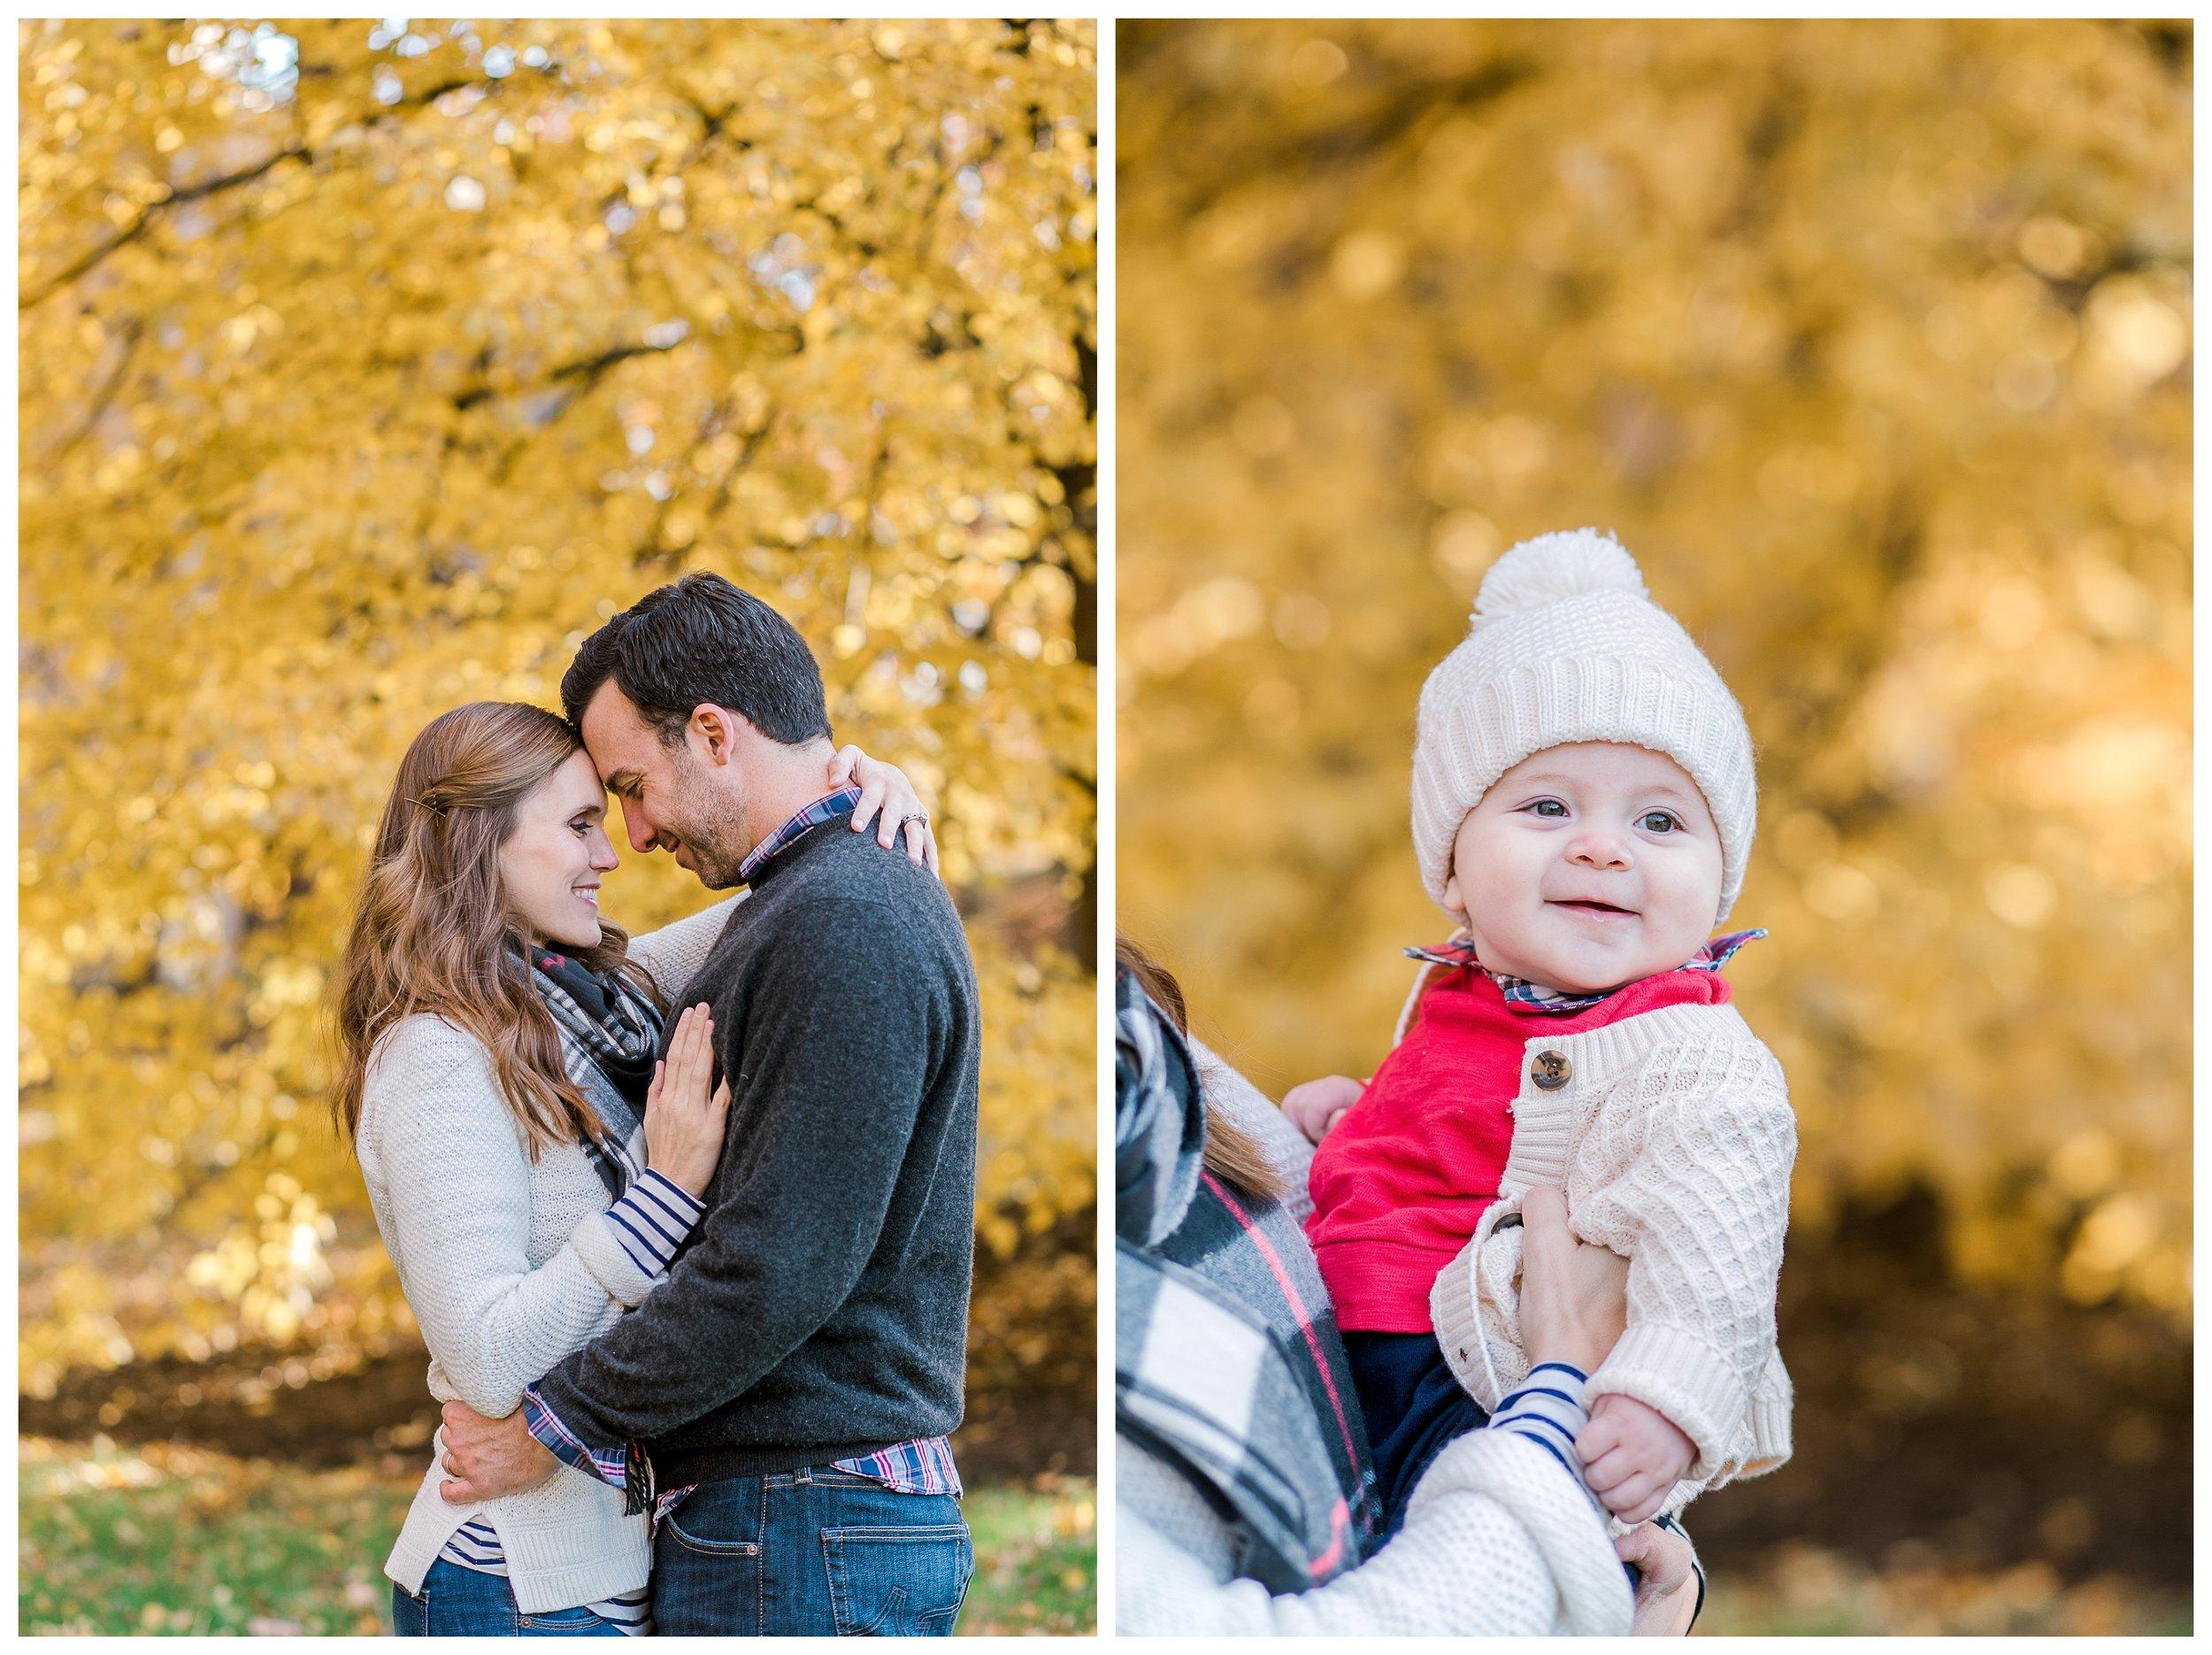 wellesley_fall_family_photographer_erica_pezente_photo (10).jpg